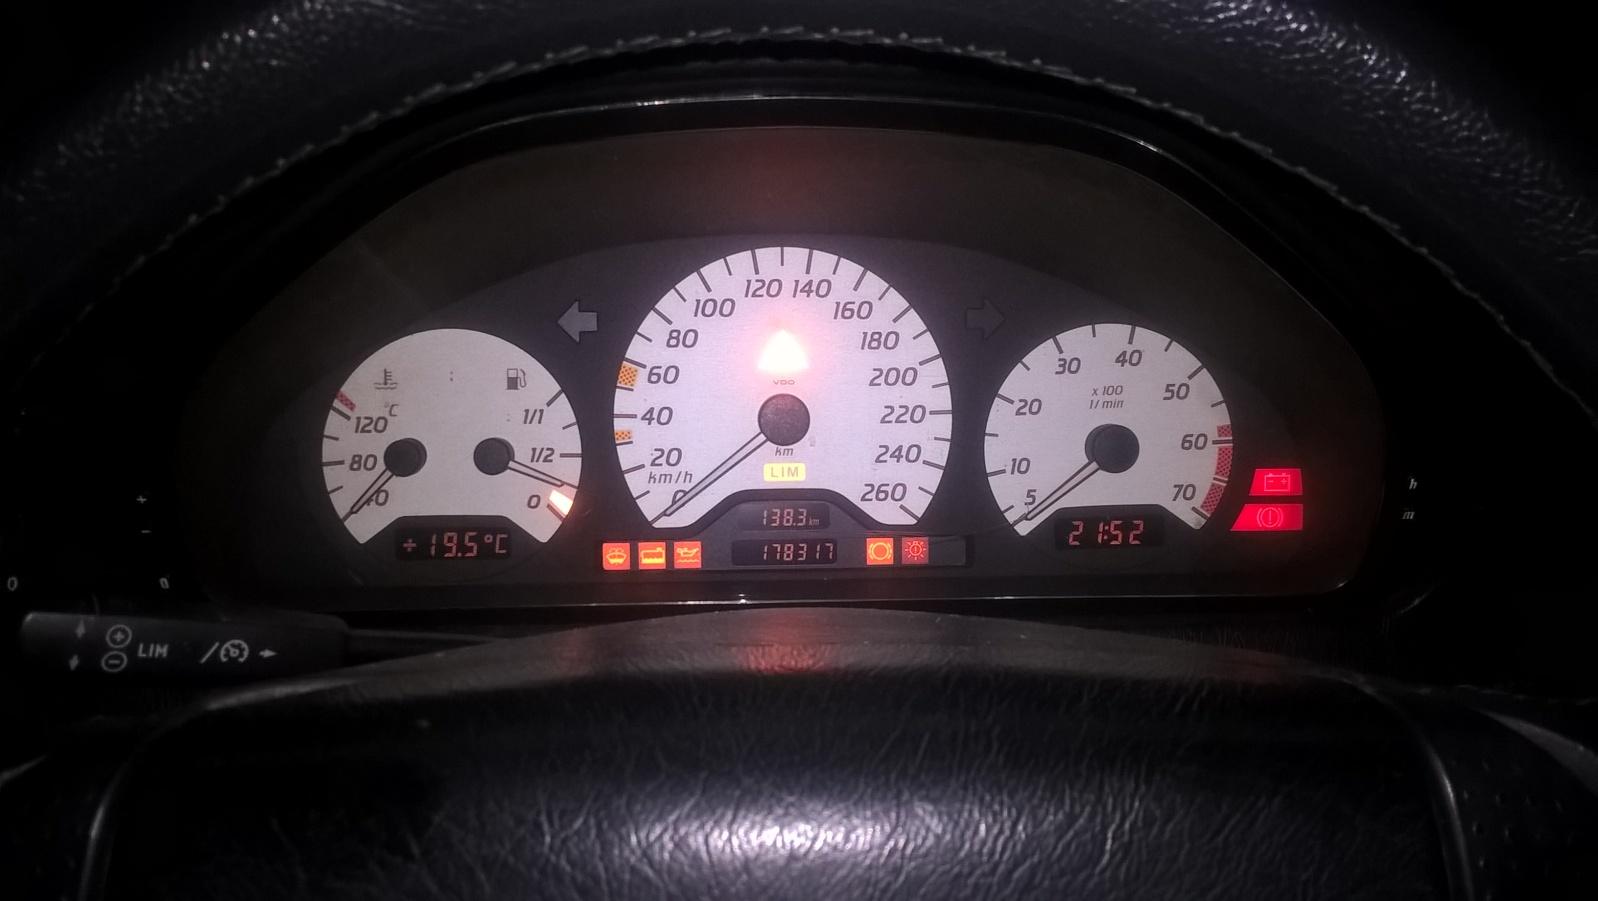 (VENDO): W202 C230 Kompressor 1997/1998 - R$ 33.000,00 2prv3hc